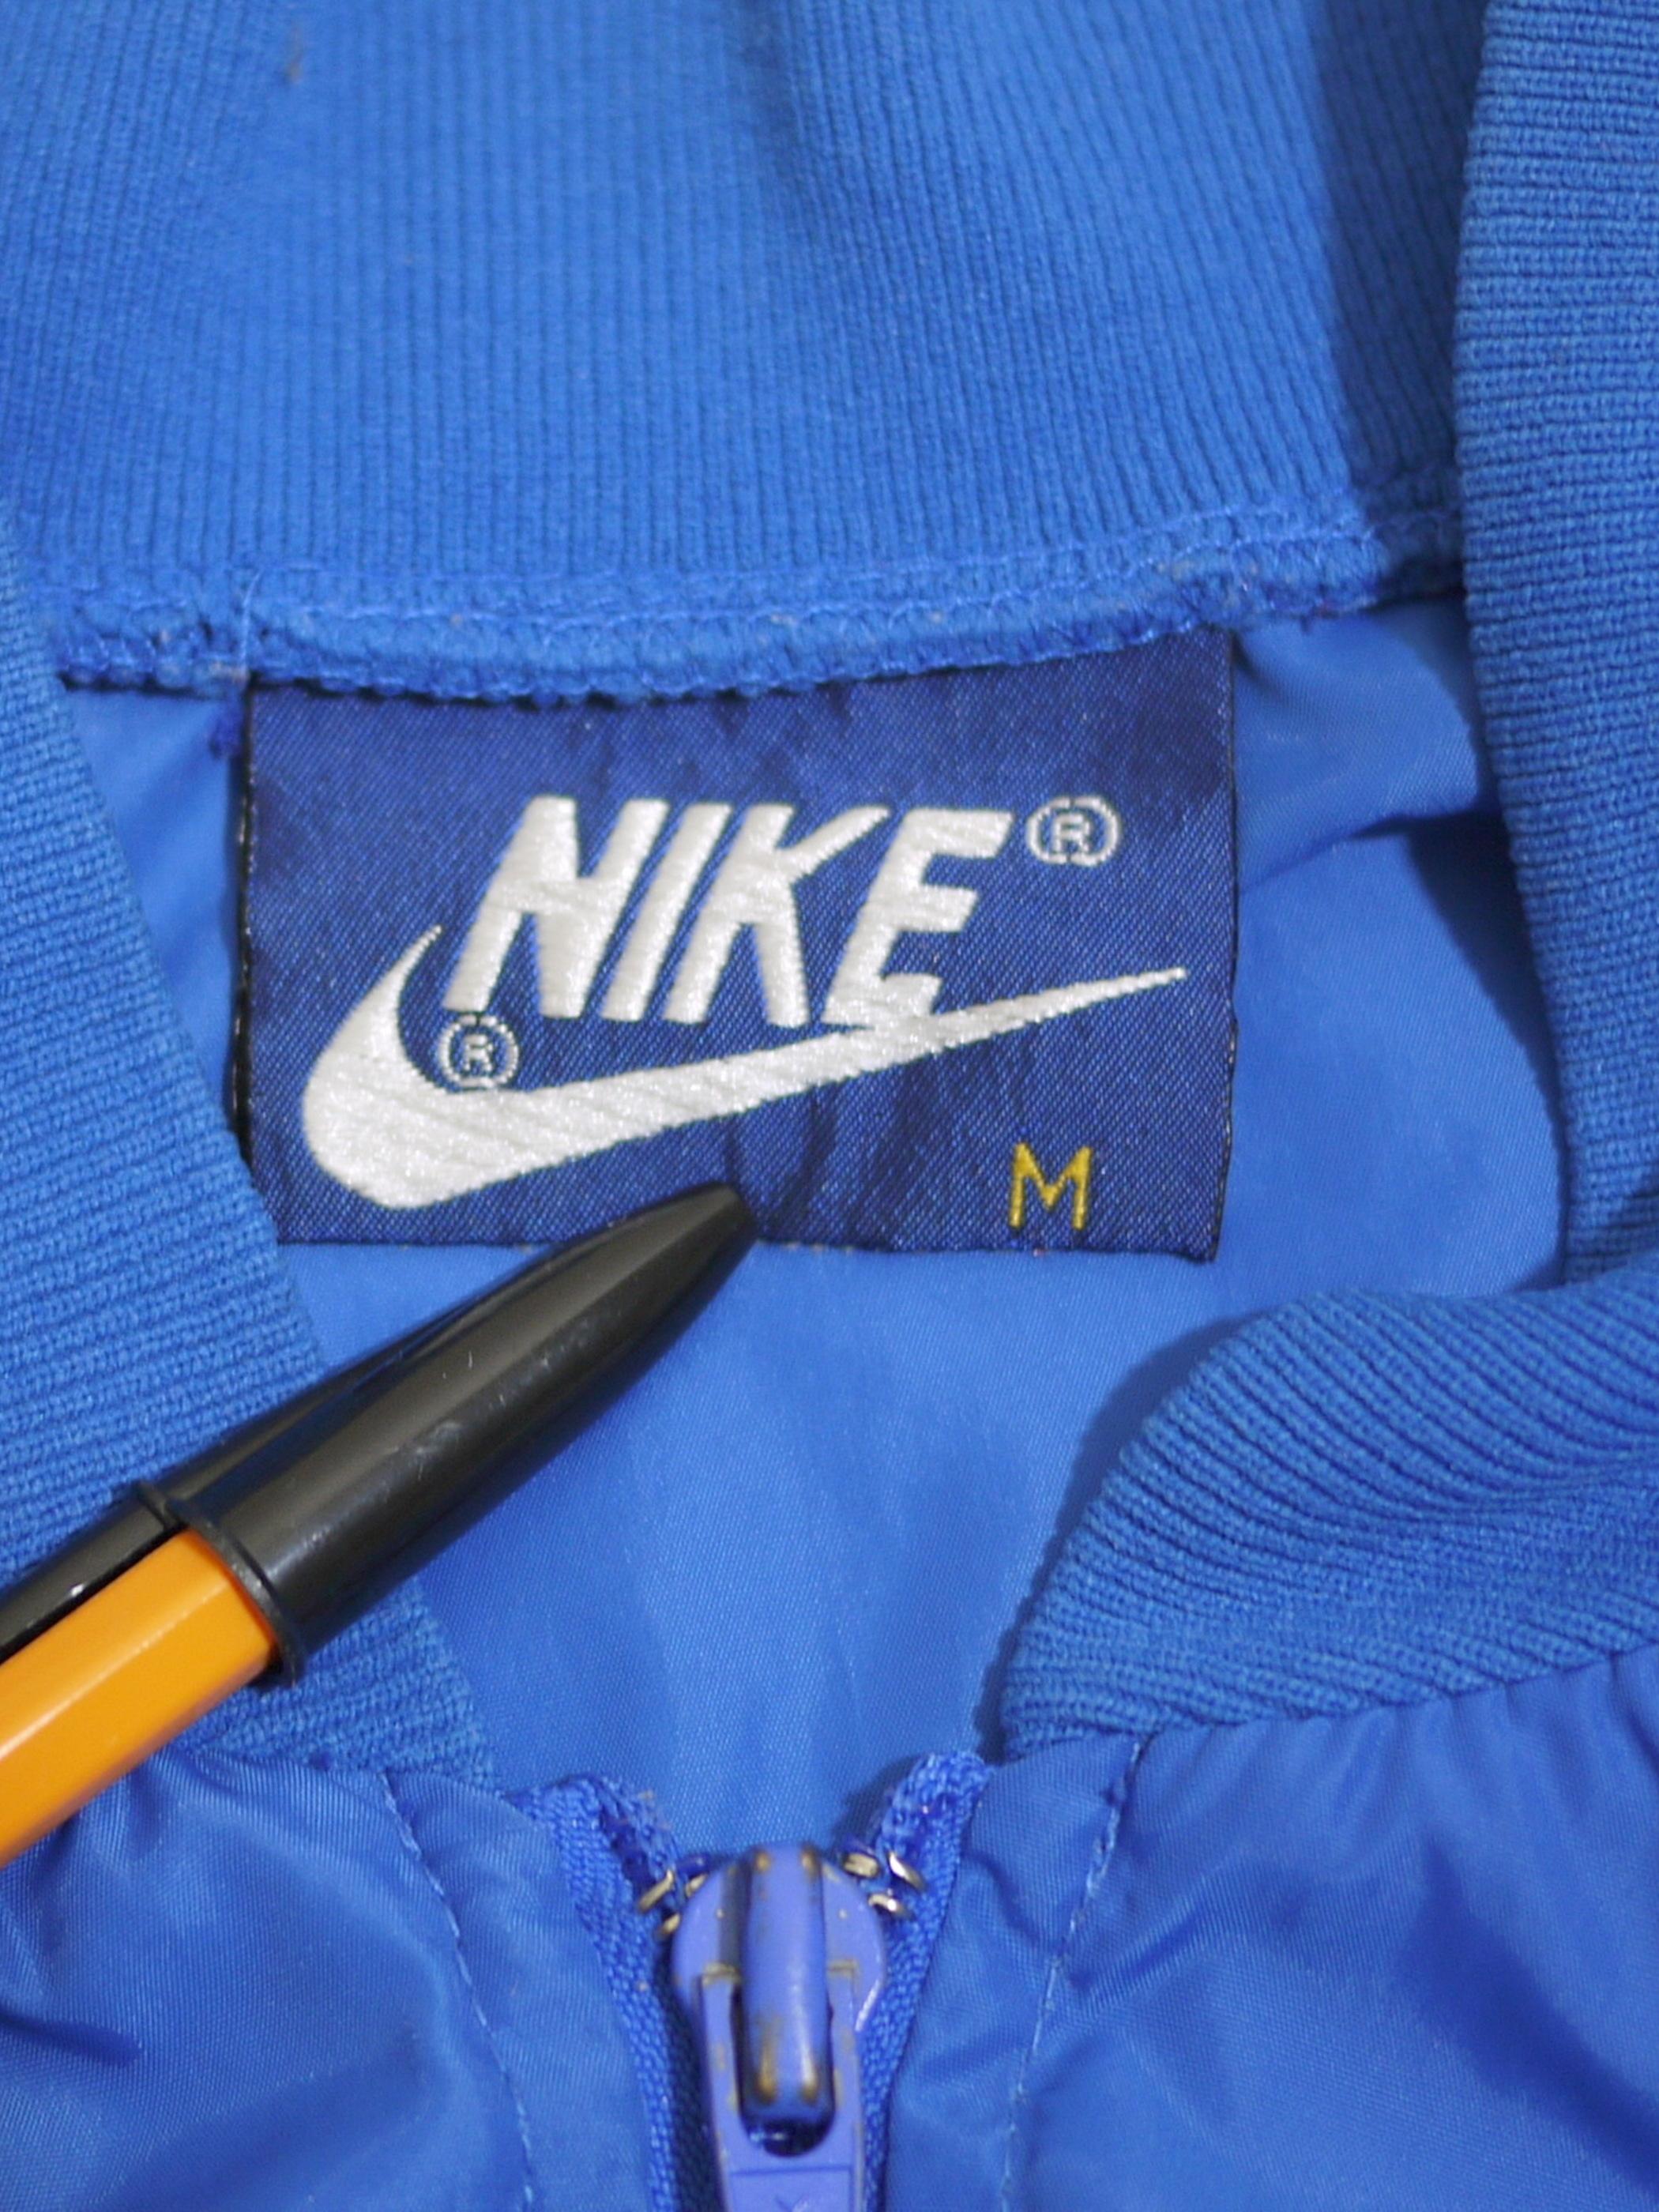 NIKE 1980's Nylon jersey SizeM